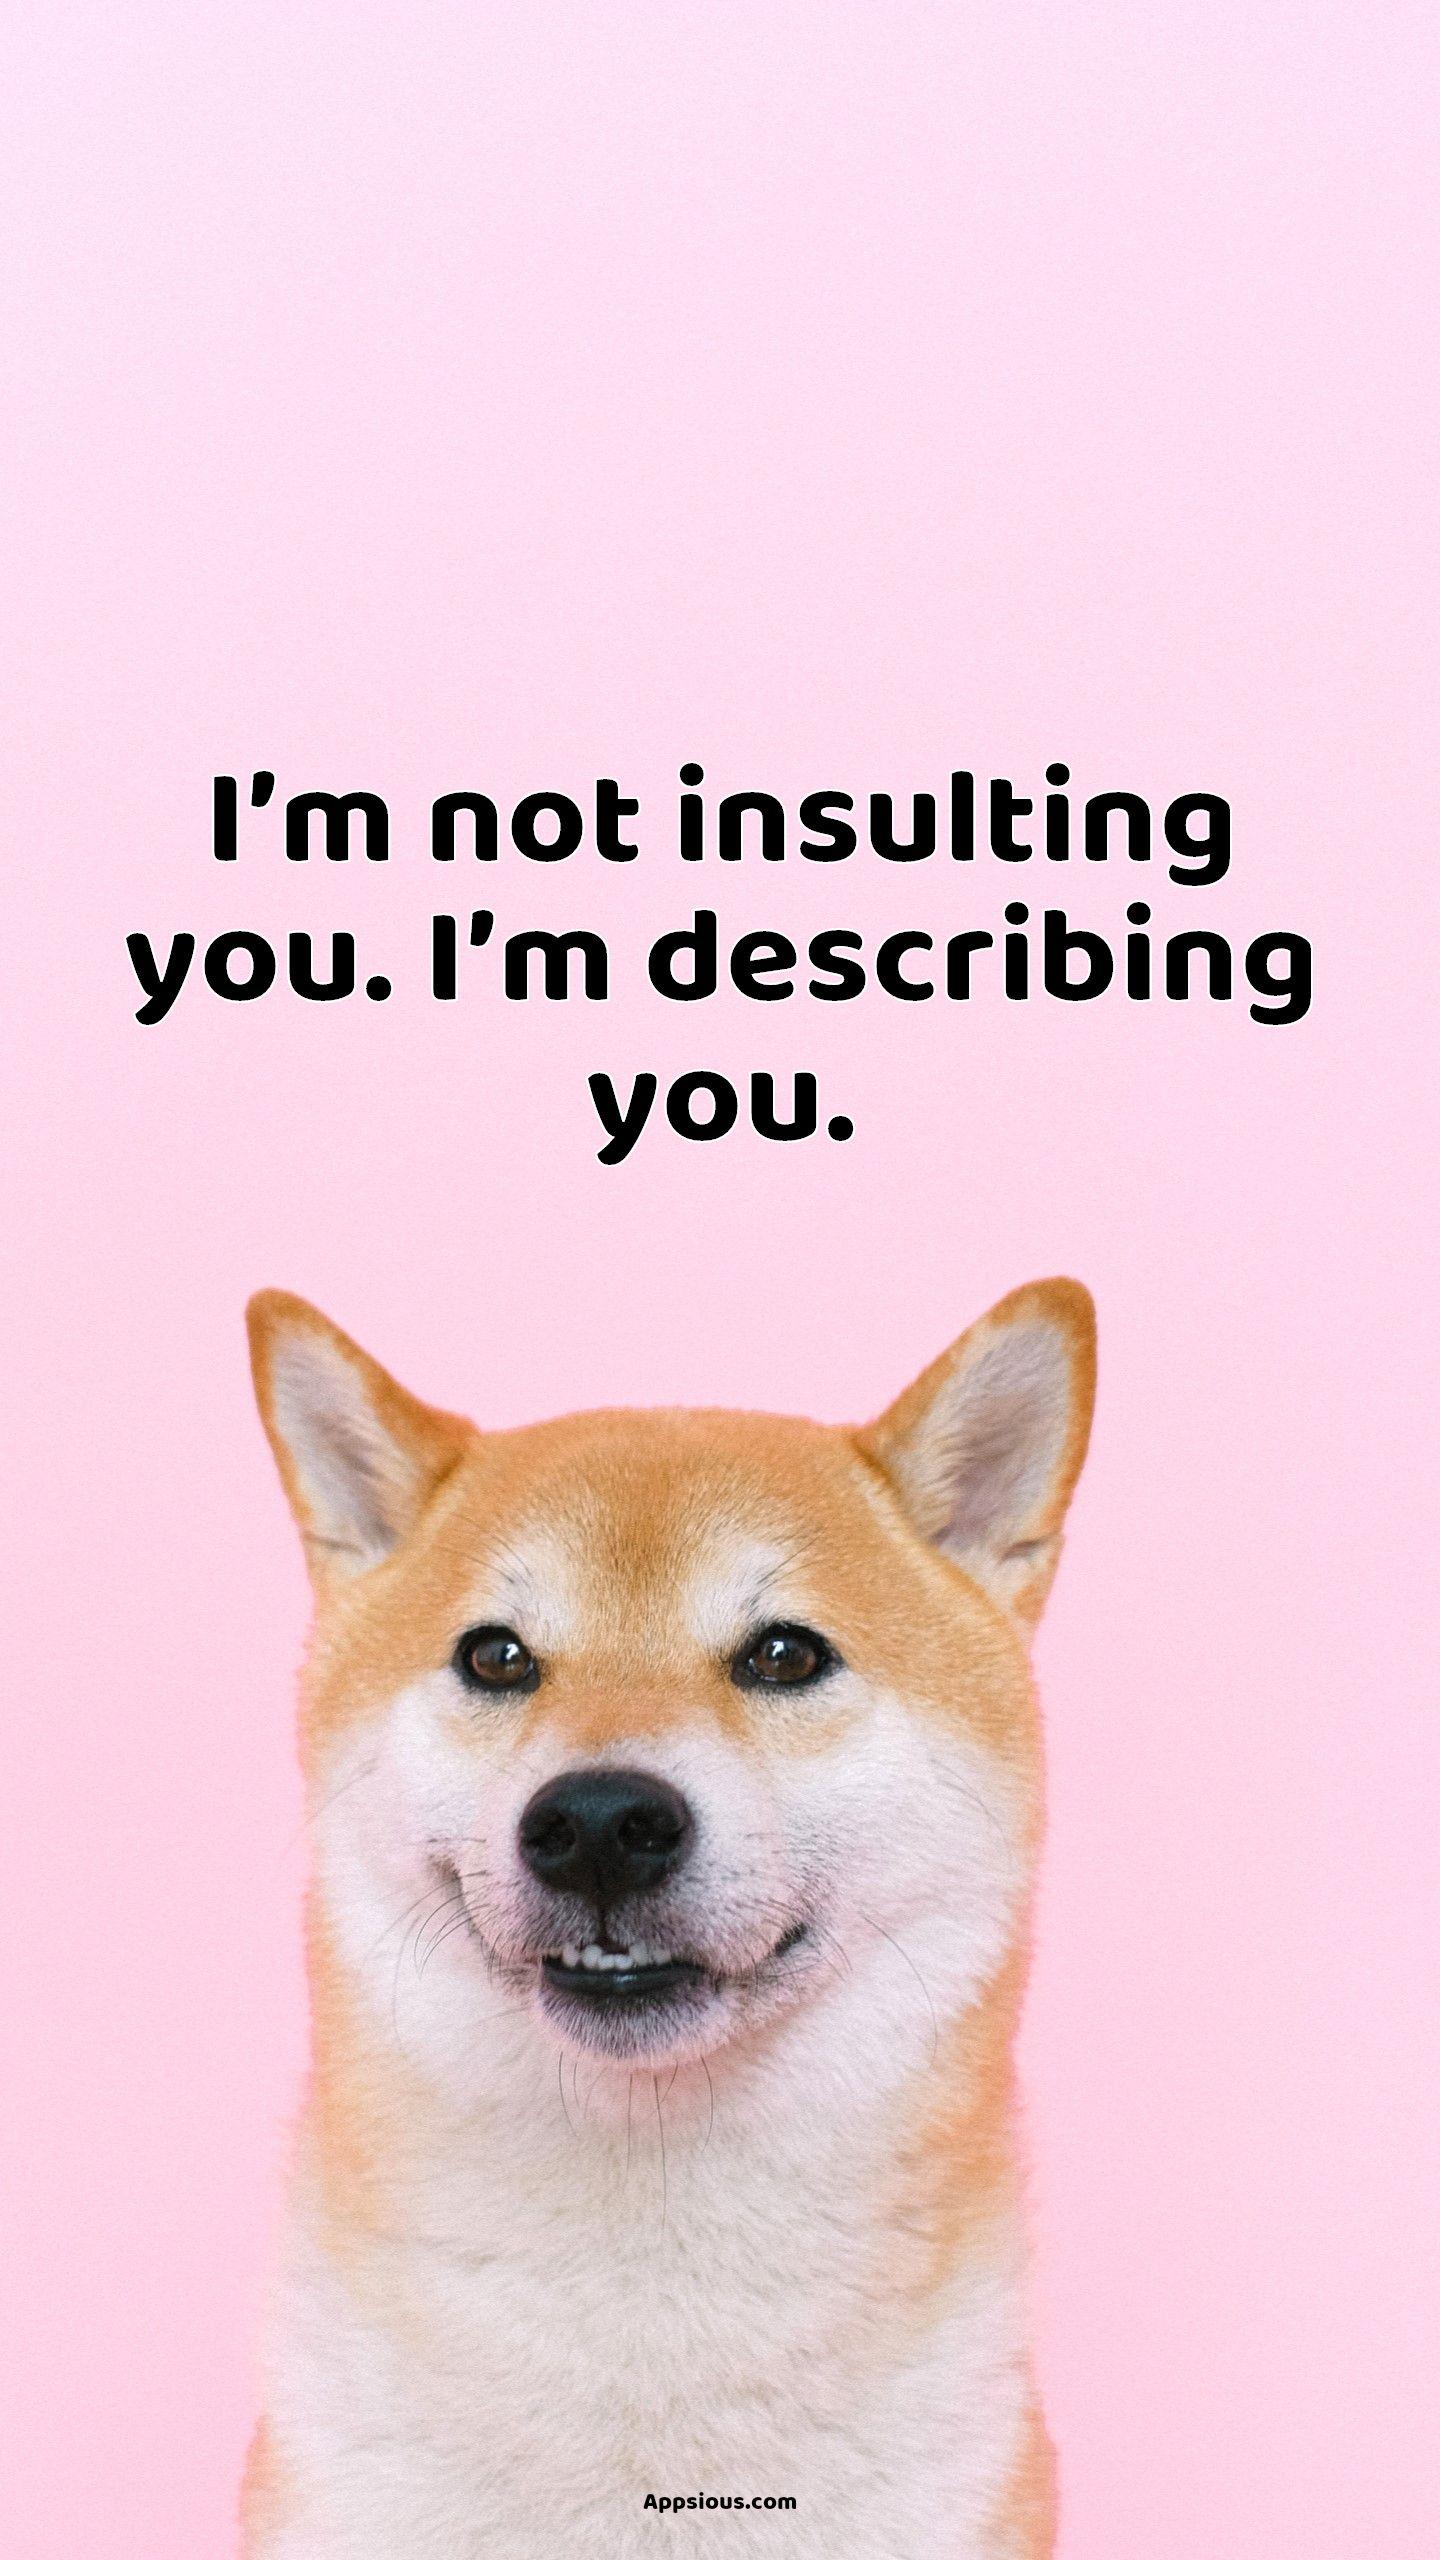 I'm not insulting you. I'm describing you.